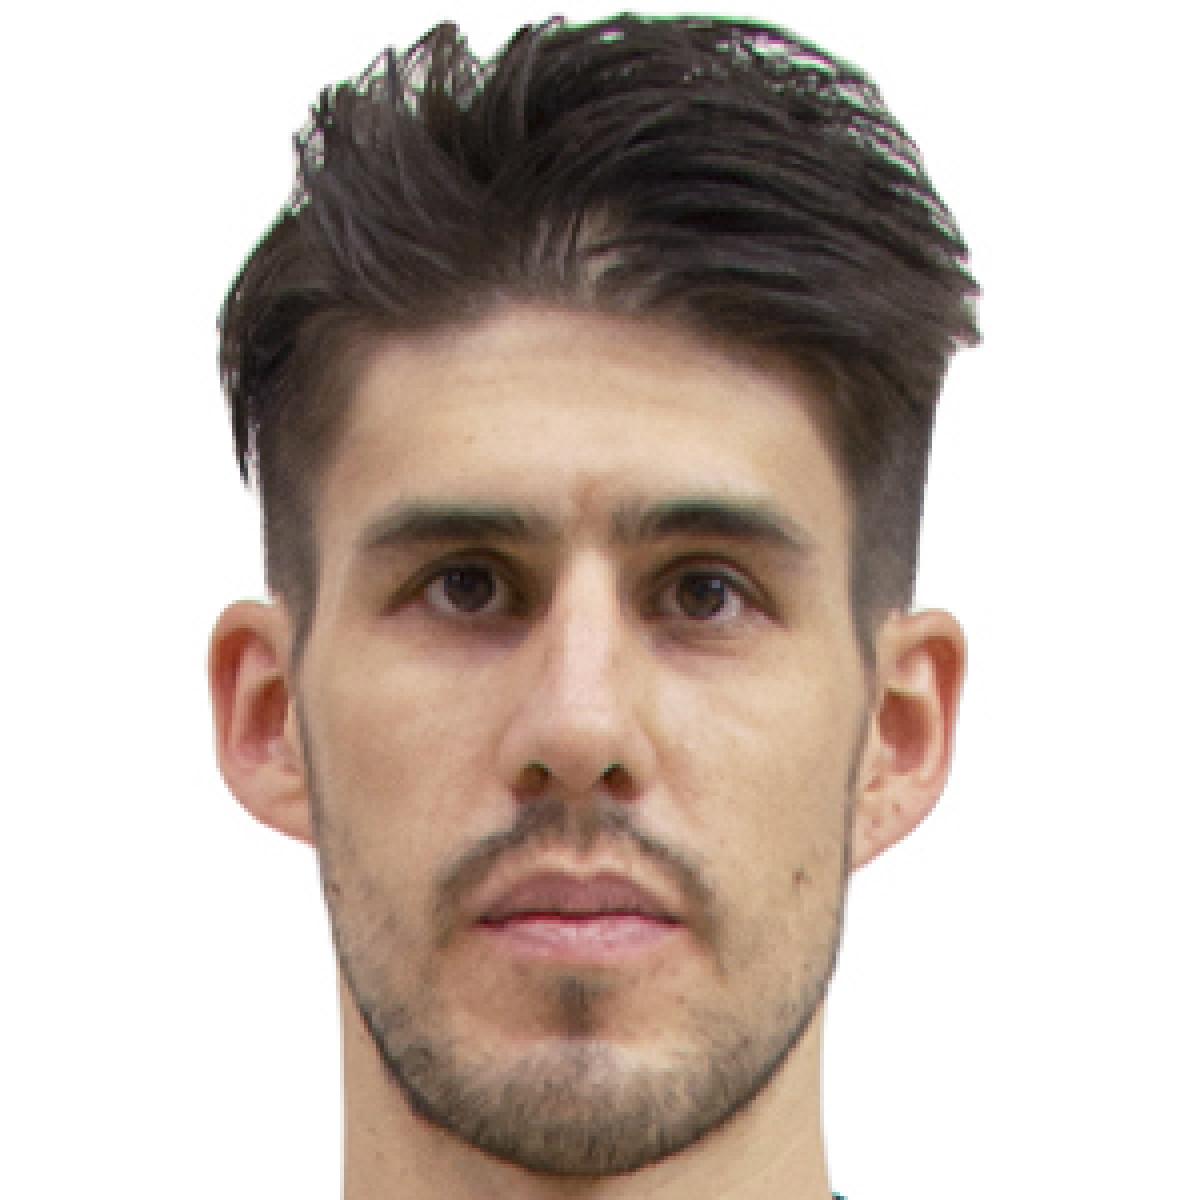 Ivan Basualdo